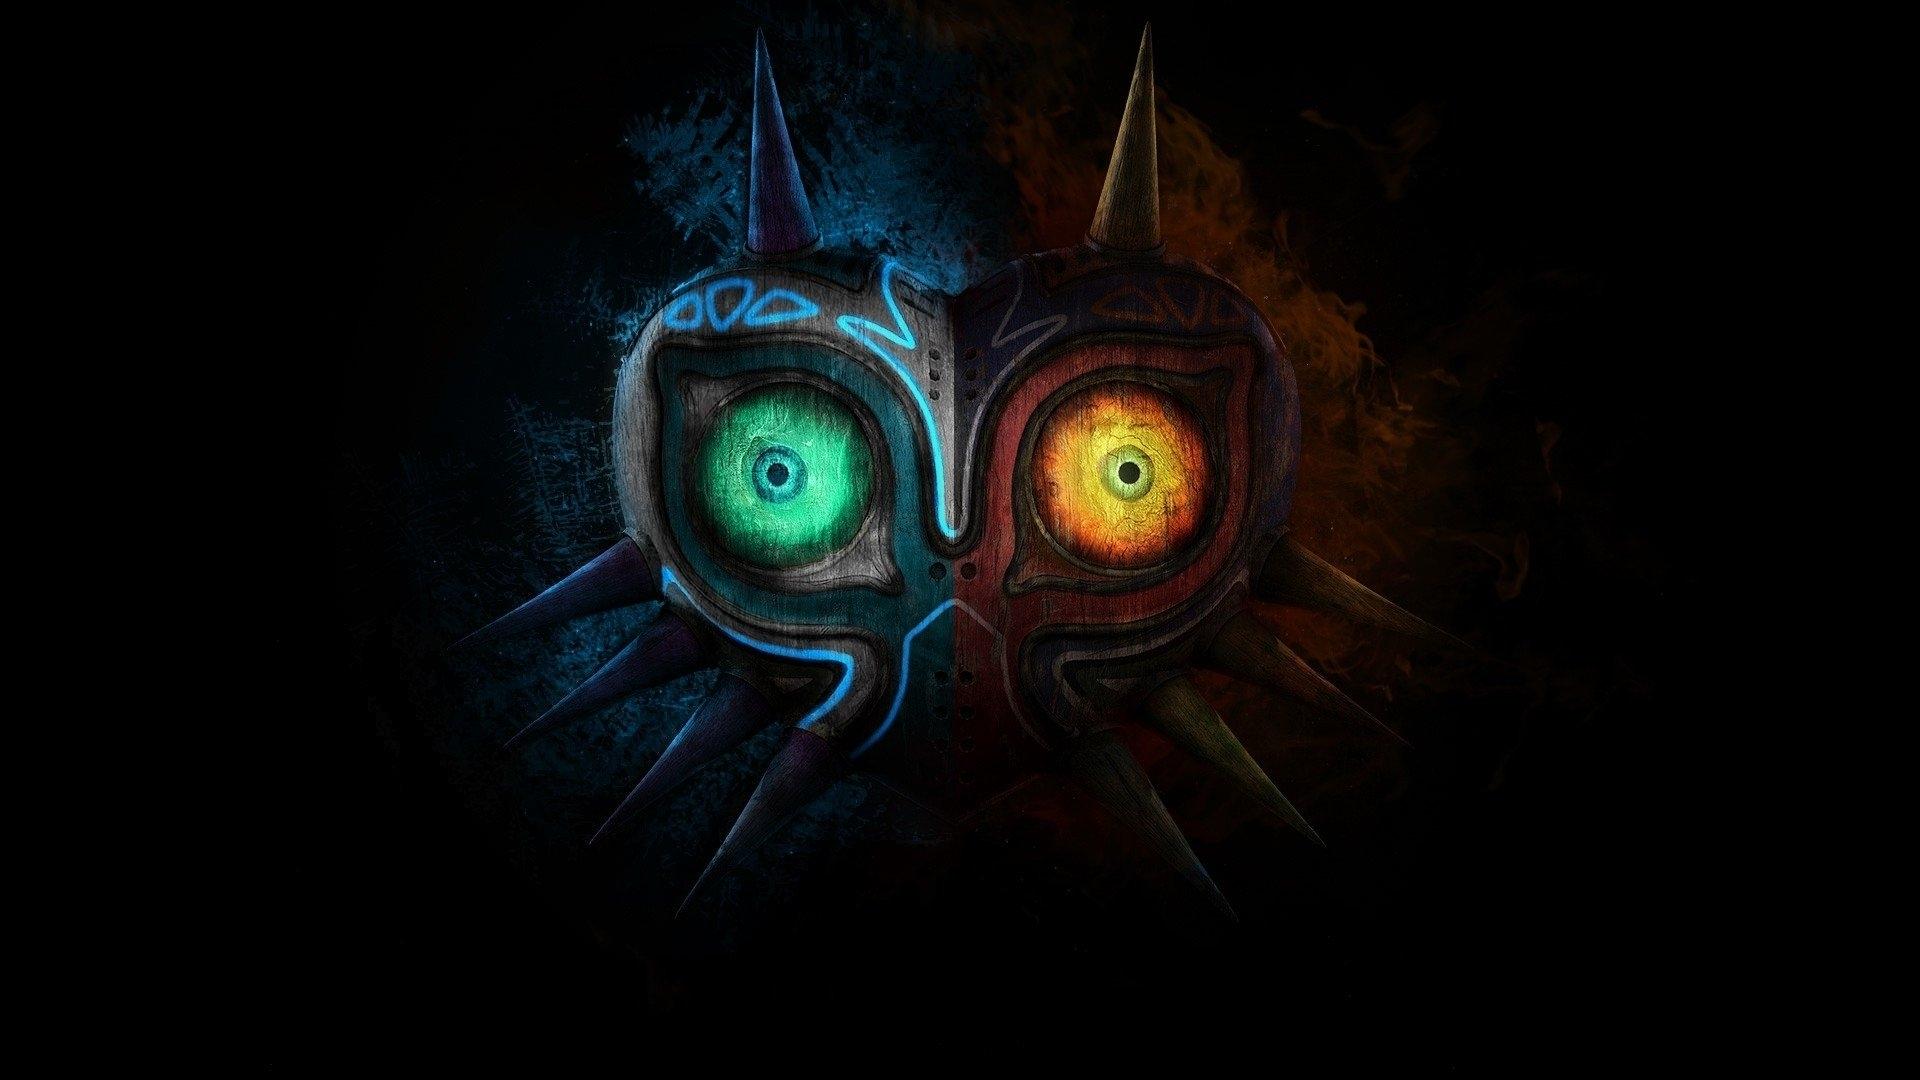 75 the legend of zelda: majora's mask hd wallpapers | background